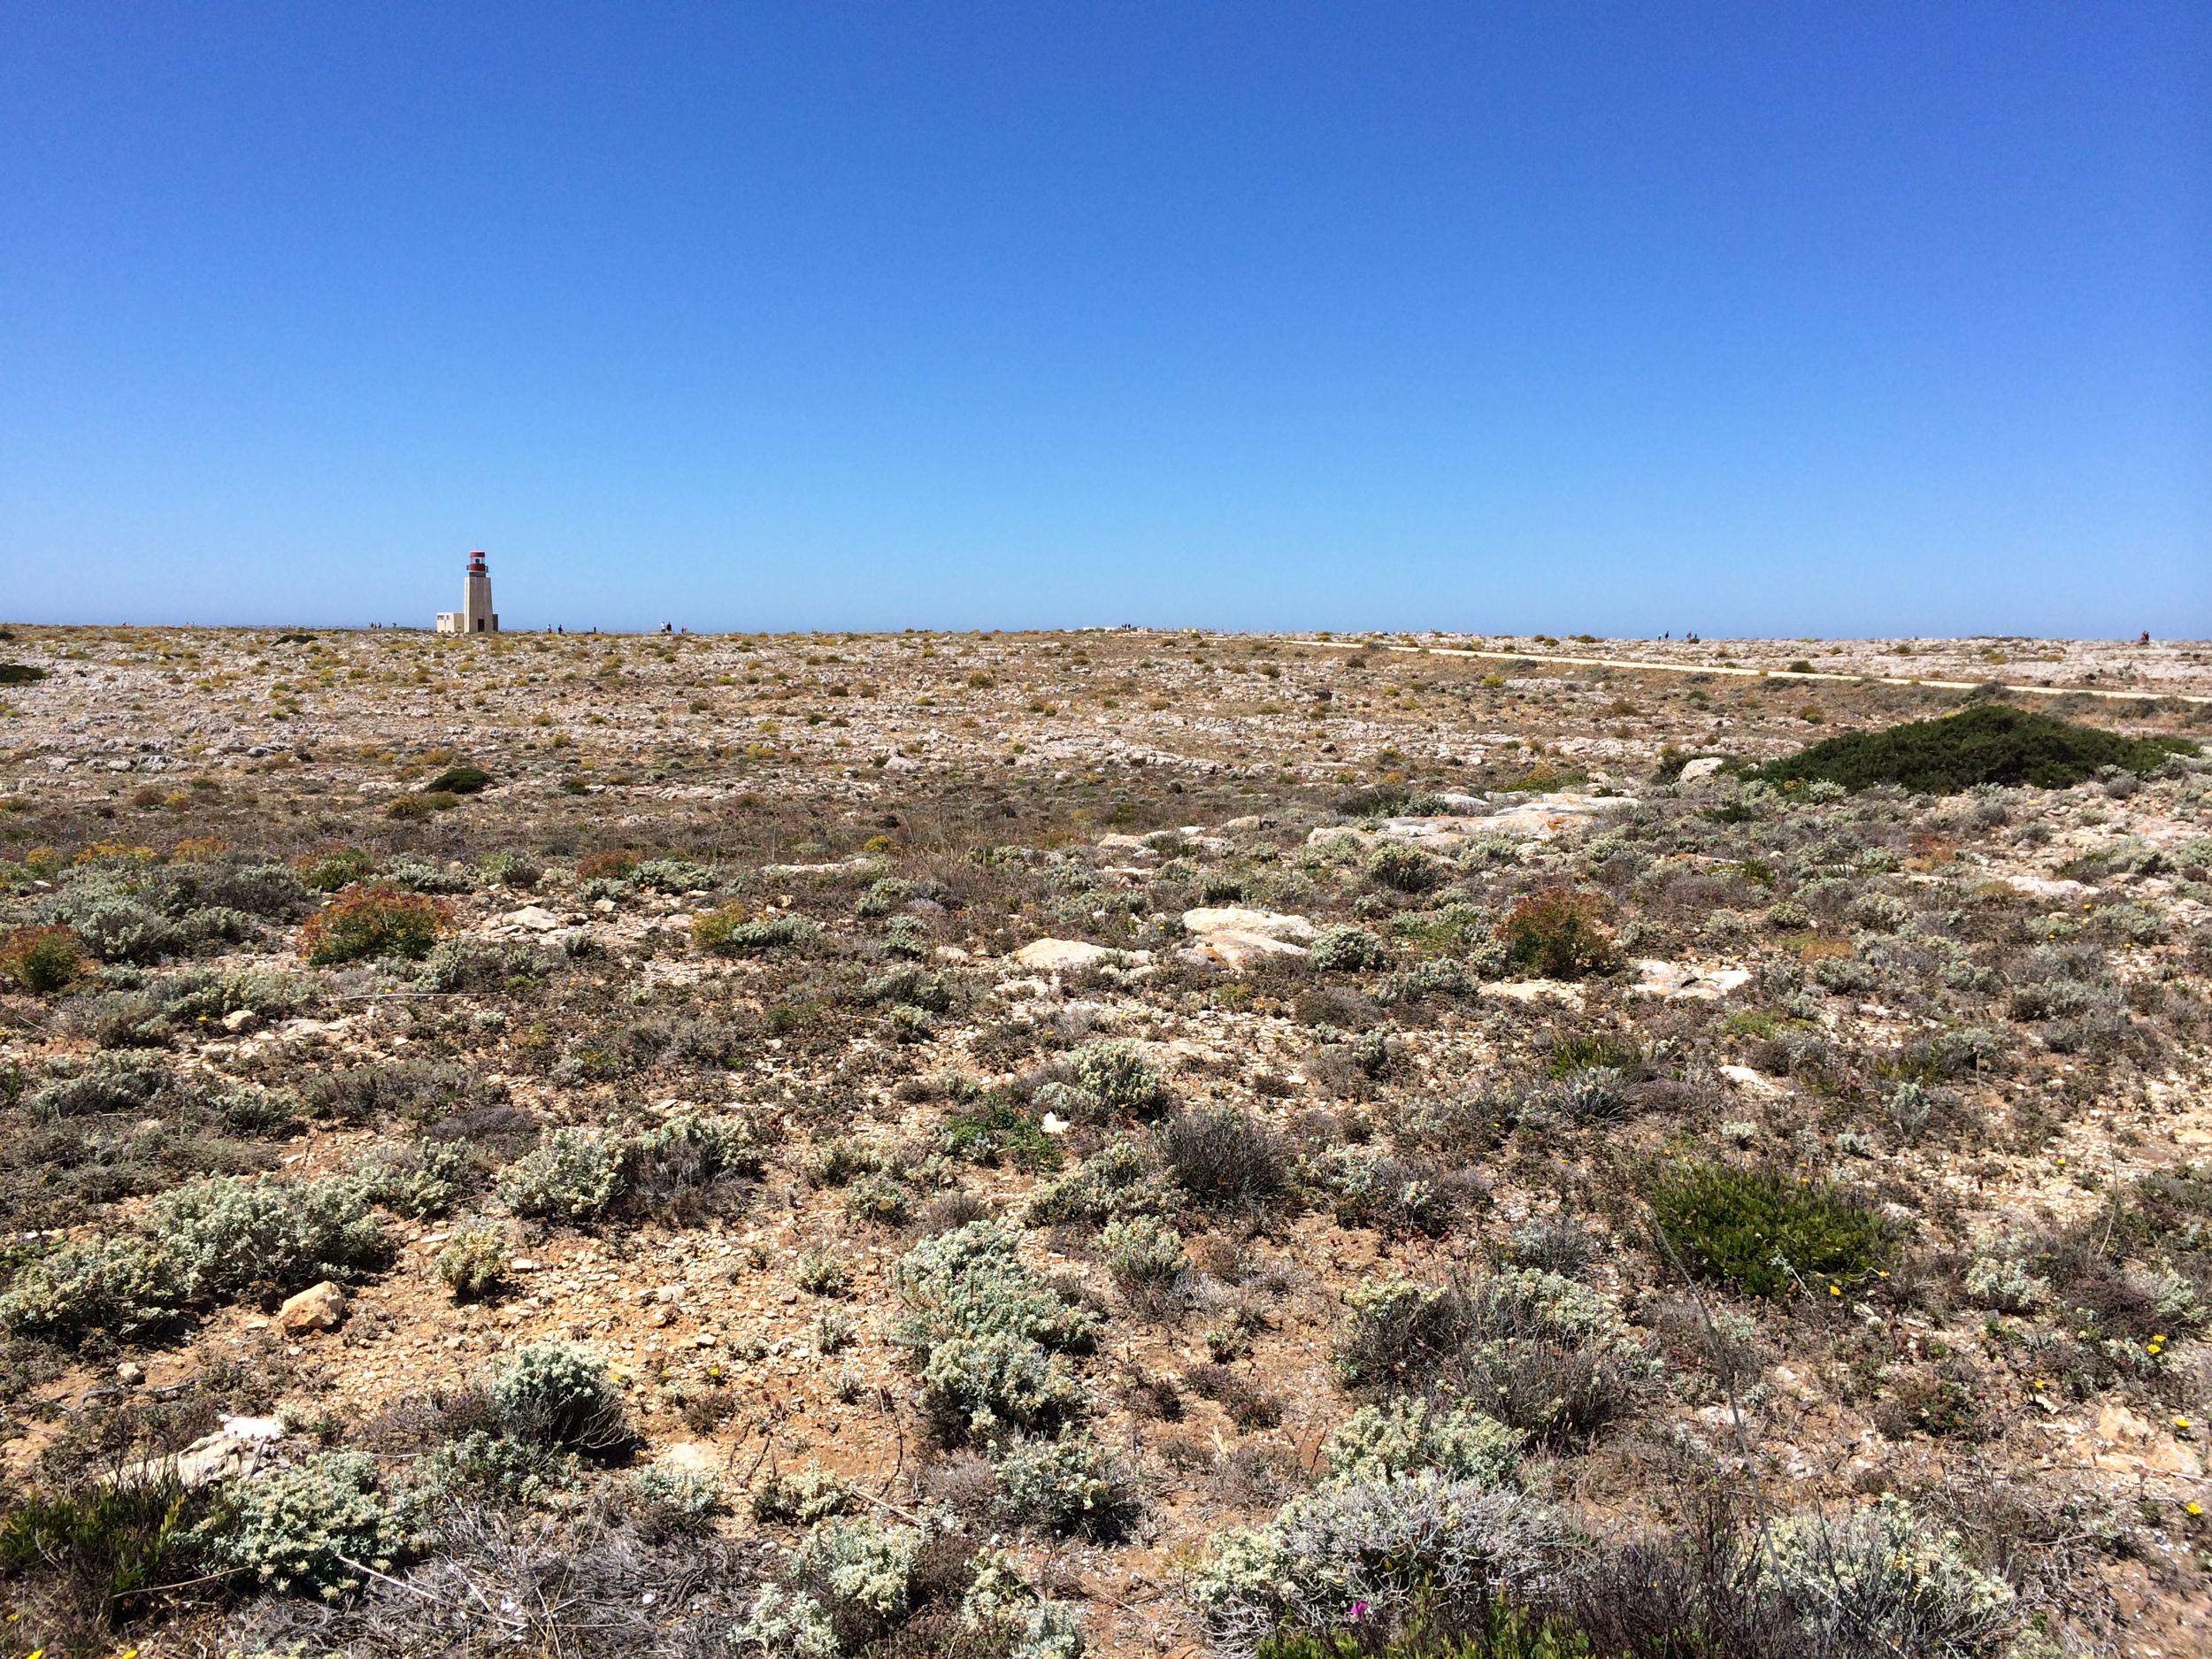 The peninsula has a really unforgiving terrain. If it weren't for the wind I'd feel I was in a desert.